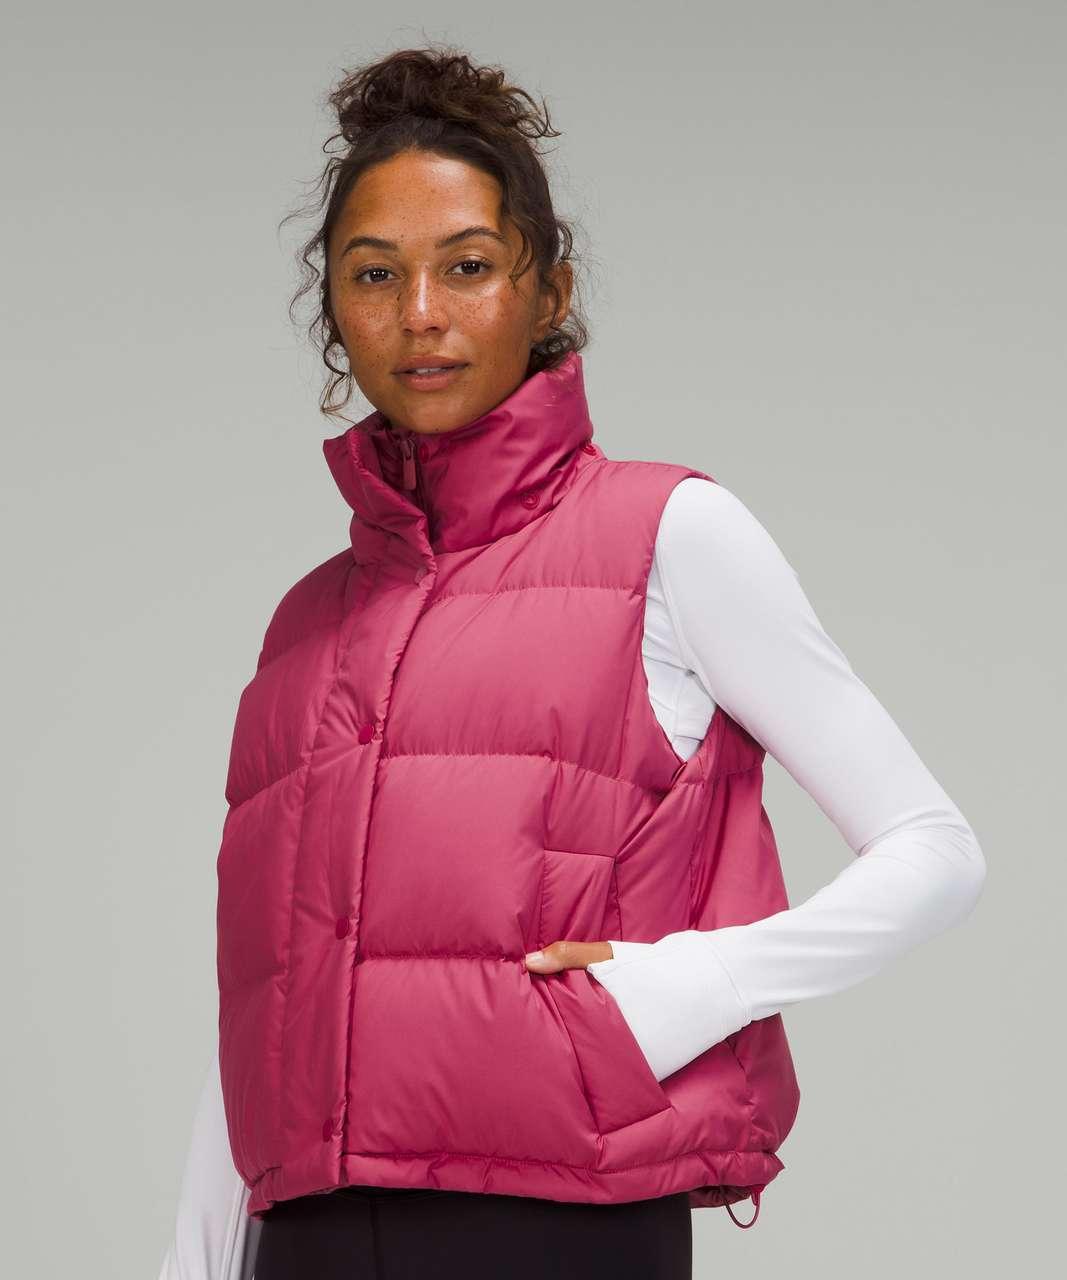 Lululemon Wunder Puff Crop Vest - Pink Lychee